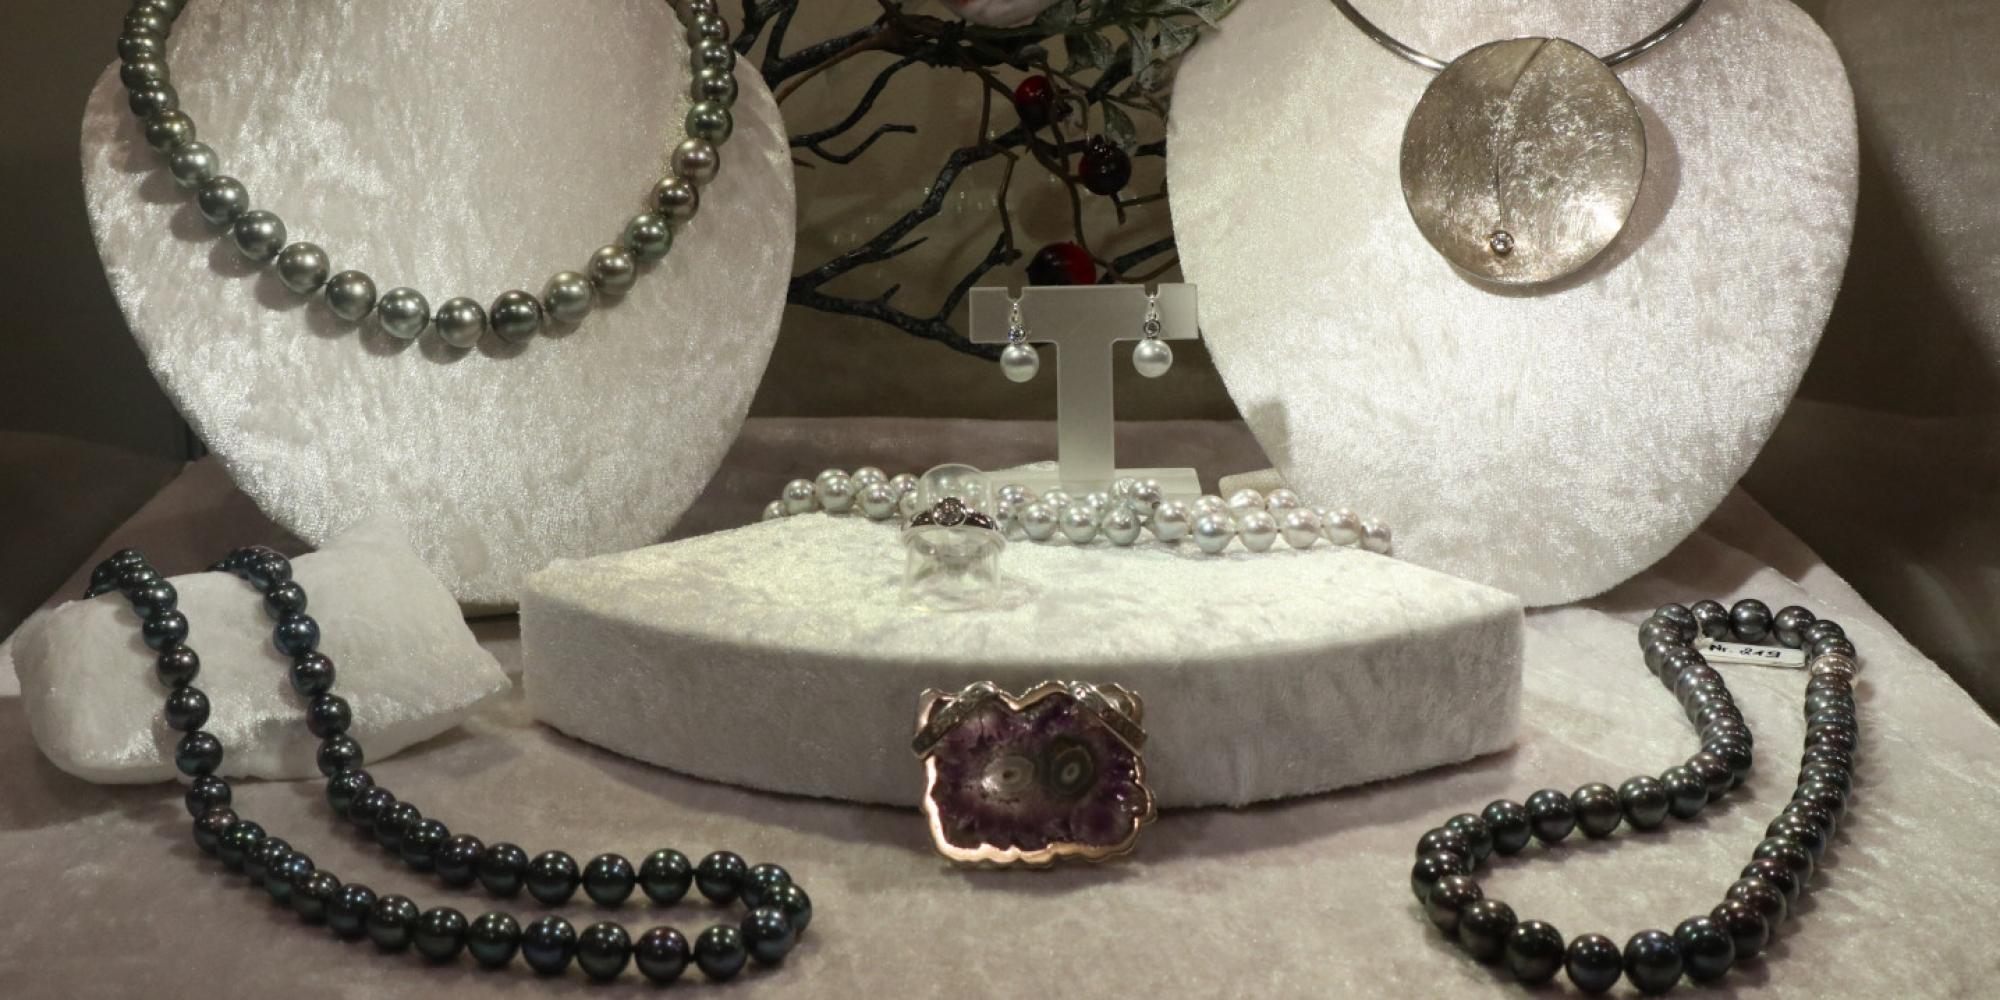 2021-01-03.Vitrine.Tahiti.Suesswasser.Perlen.Goldschmiede.Mace.1520×718